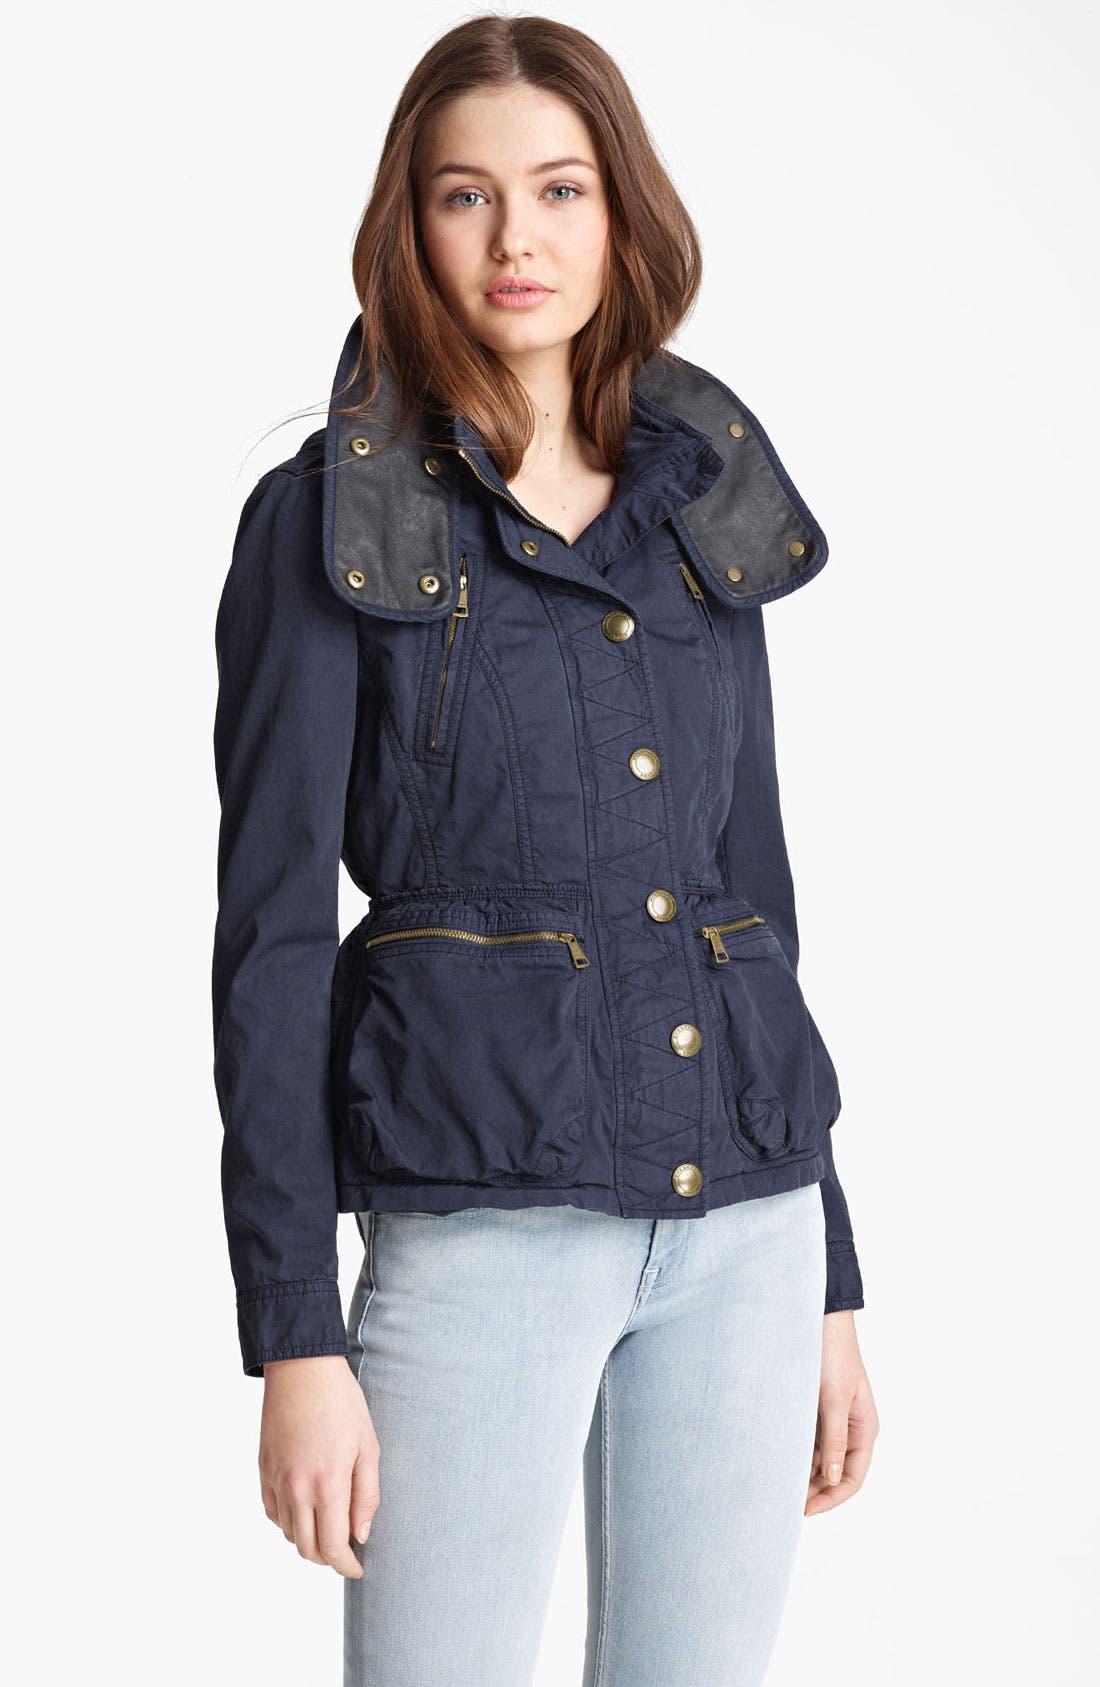 Alternate Image 1 Selected - Burberry Brit 'Broomgrovel' Jacket